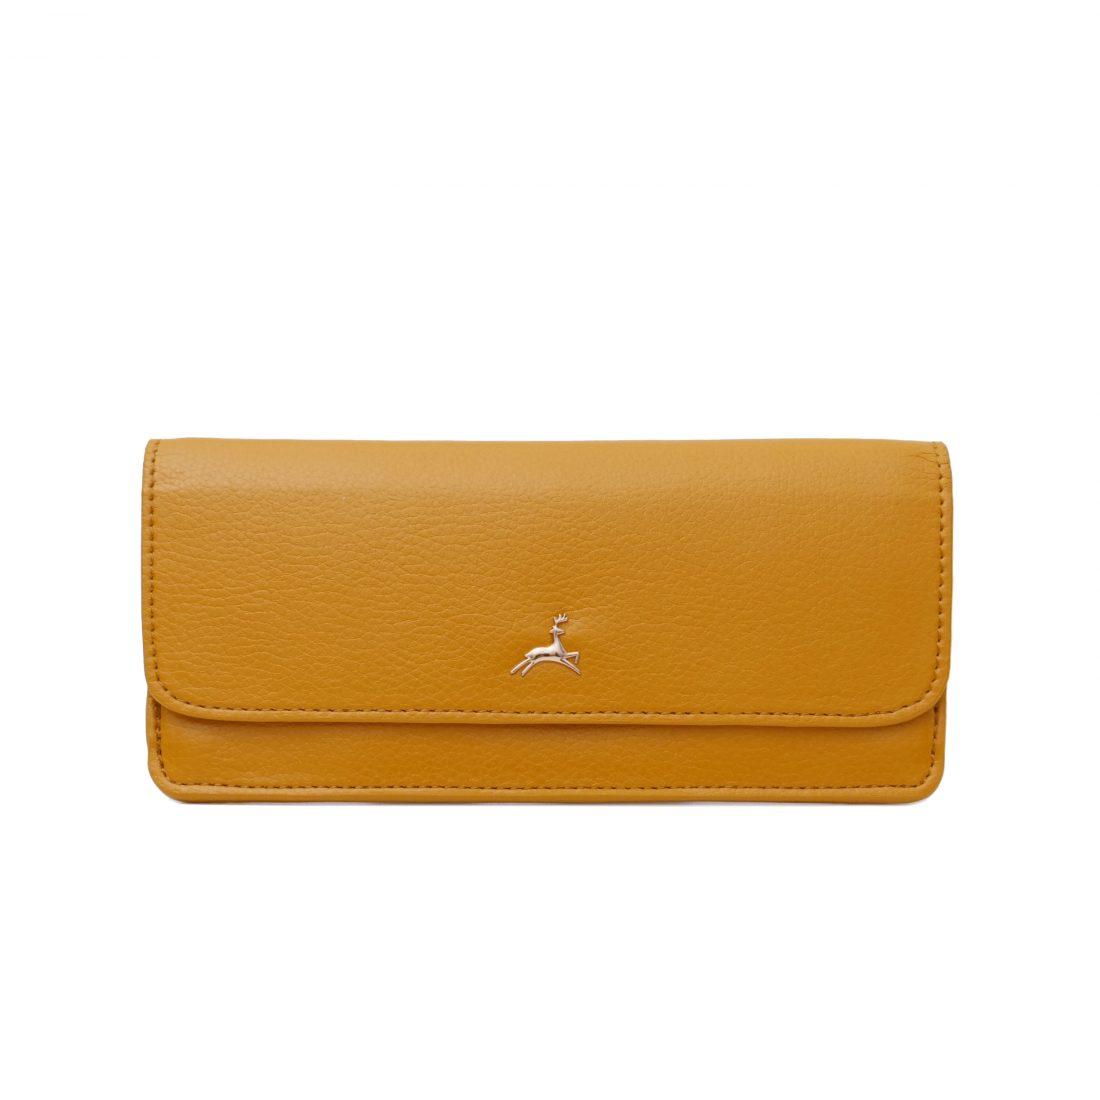 Tedu-Wallet-yellow-1